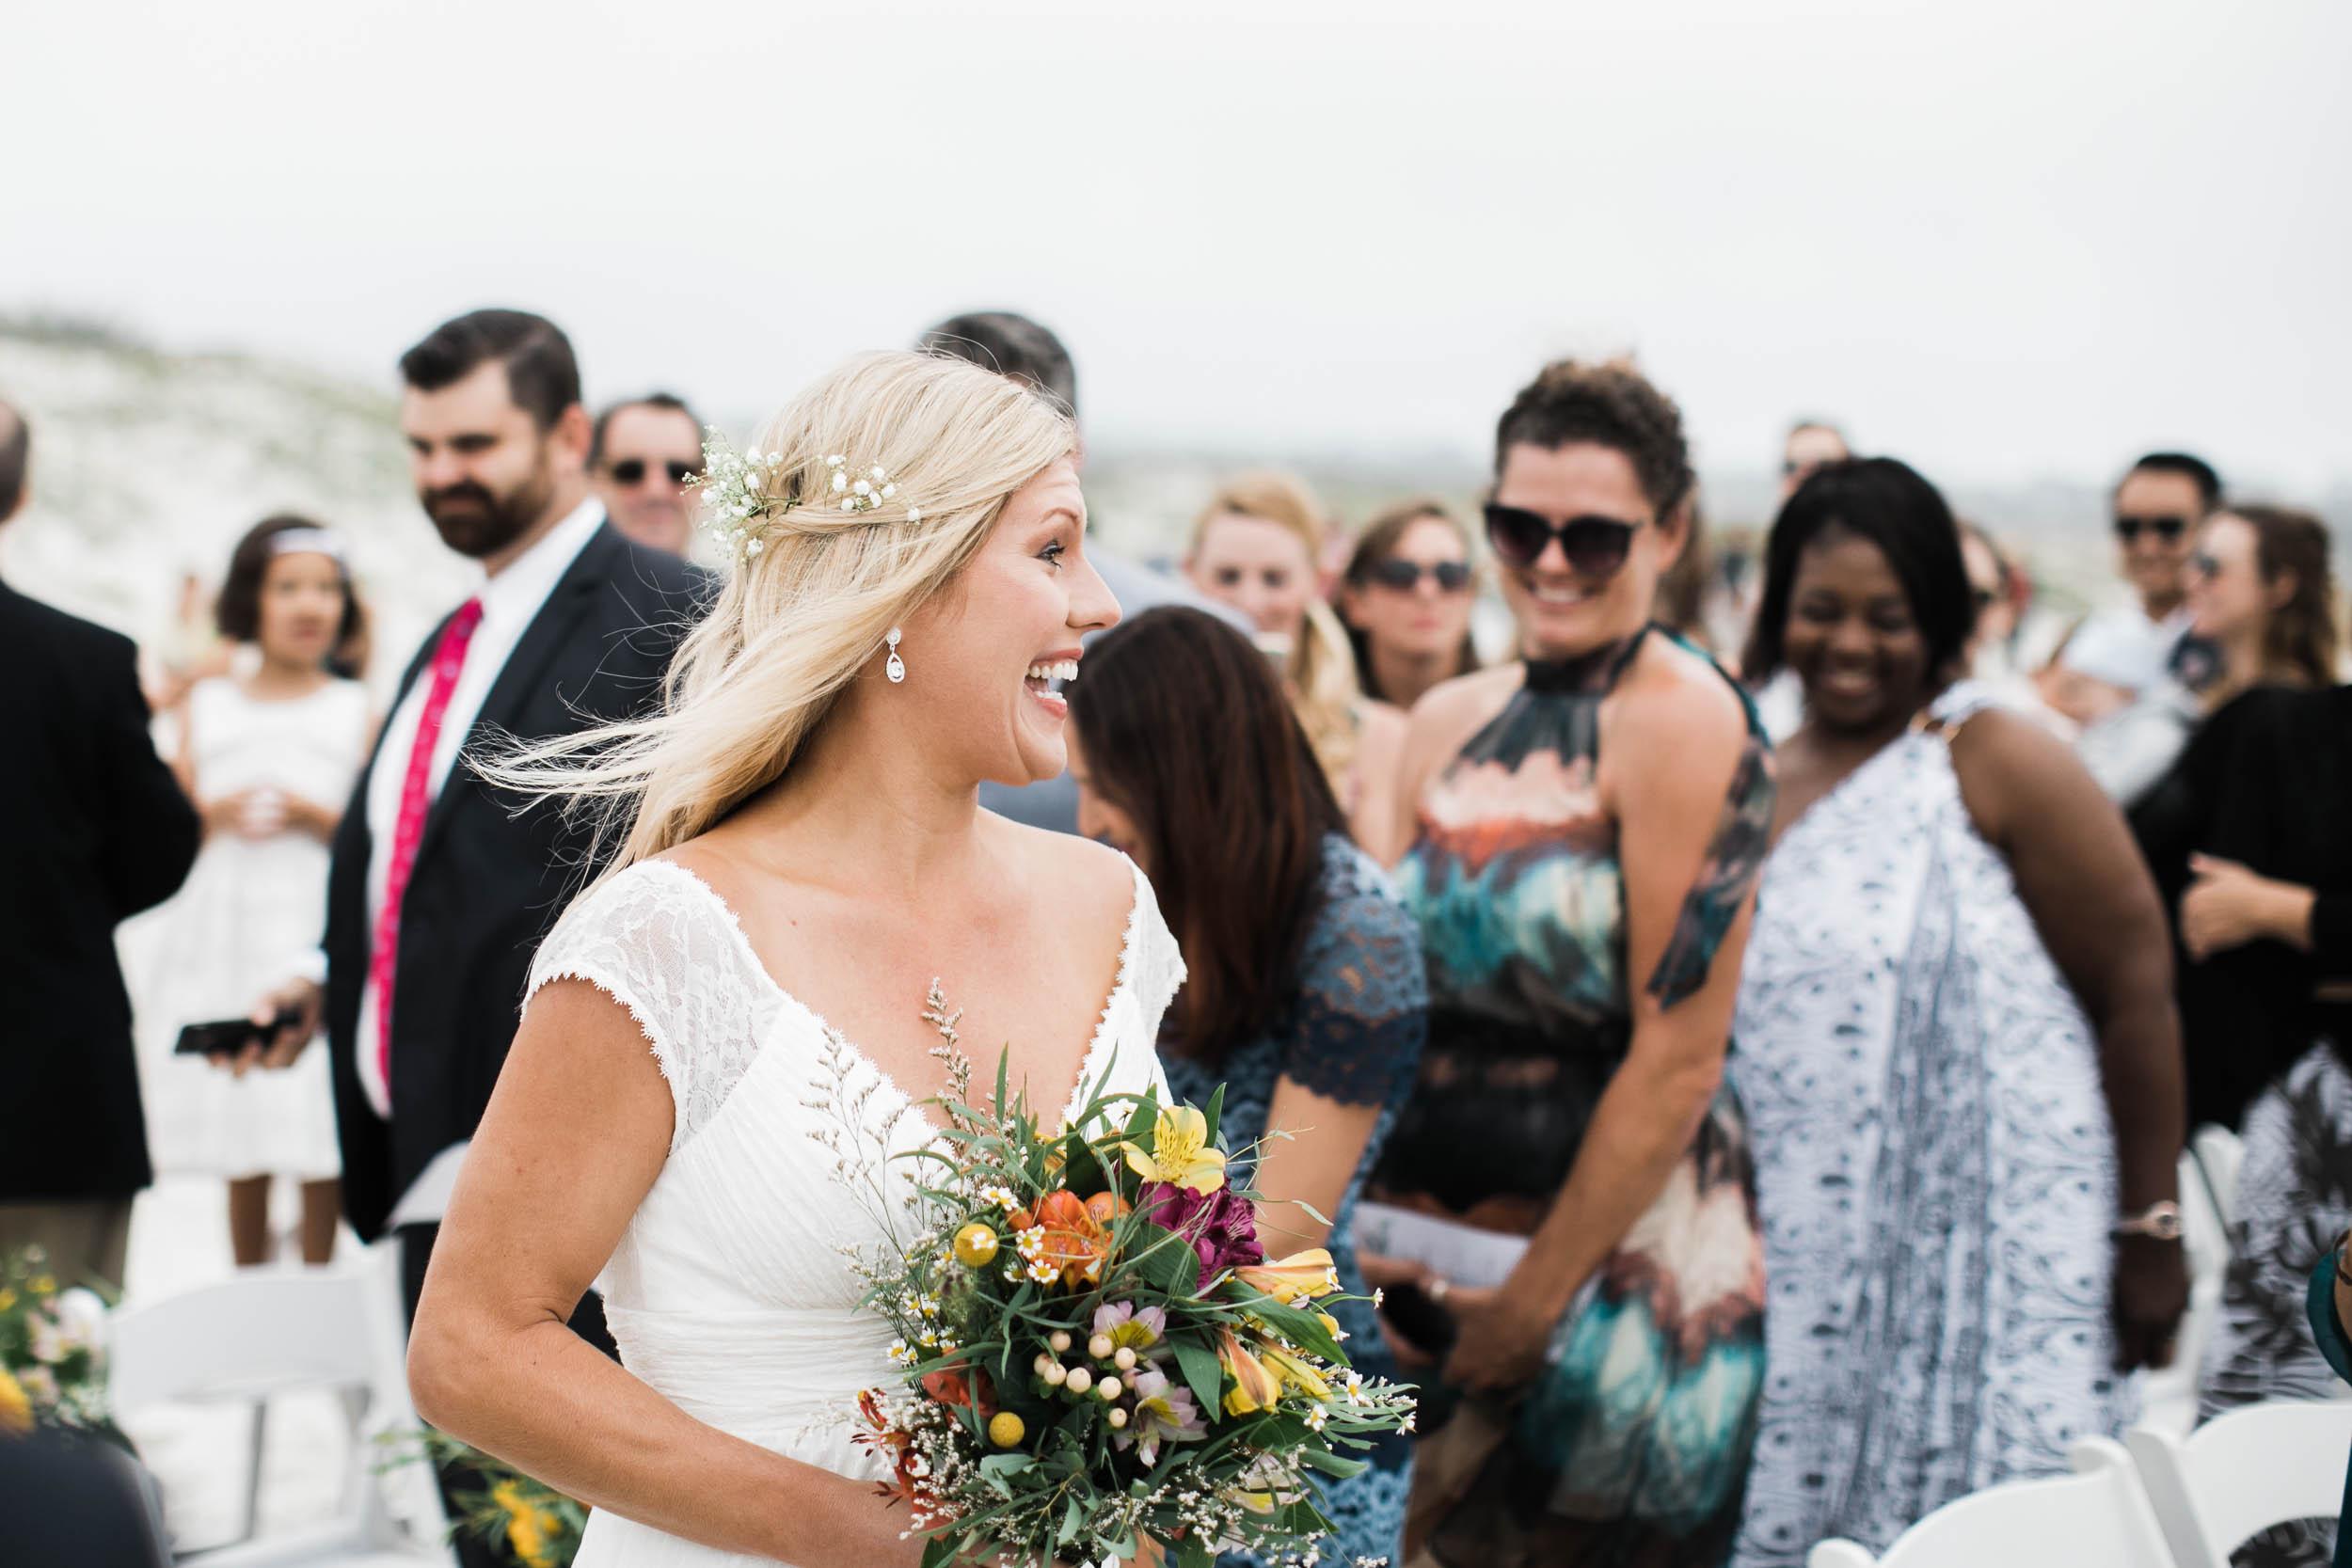 082617_C+K_Asilomar Pacific Grove Wedding_Buena Lane Photography_2411ER.jpg